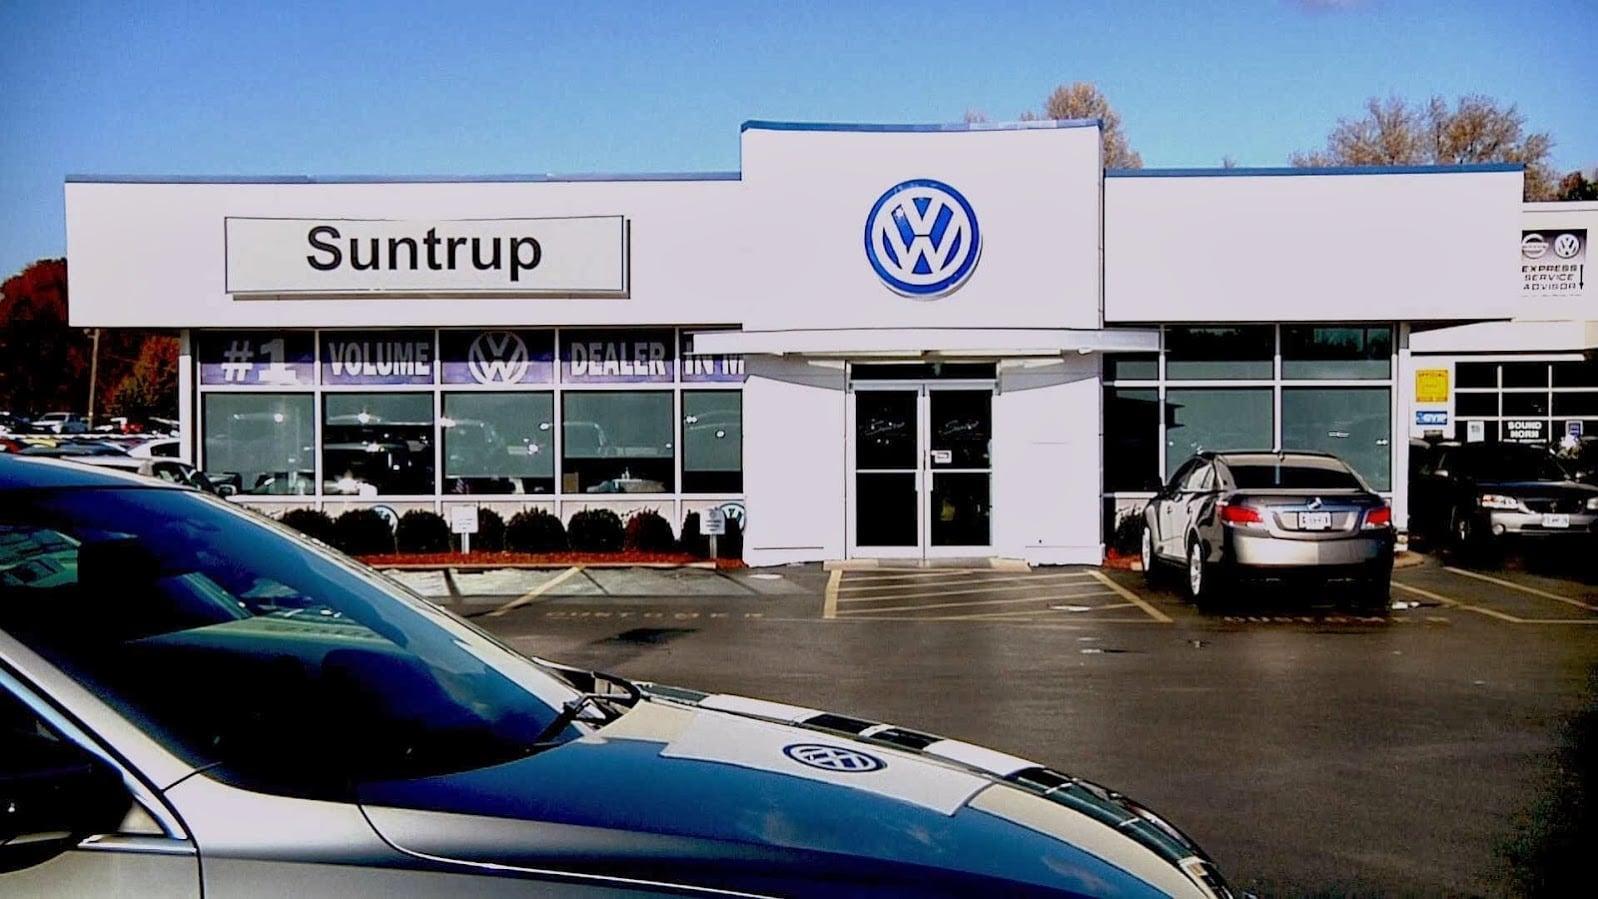 Kirkwood Area New And Used Volkswagen Dealership Suntrup